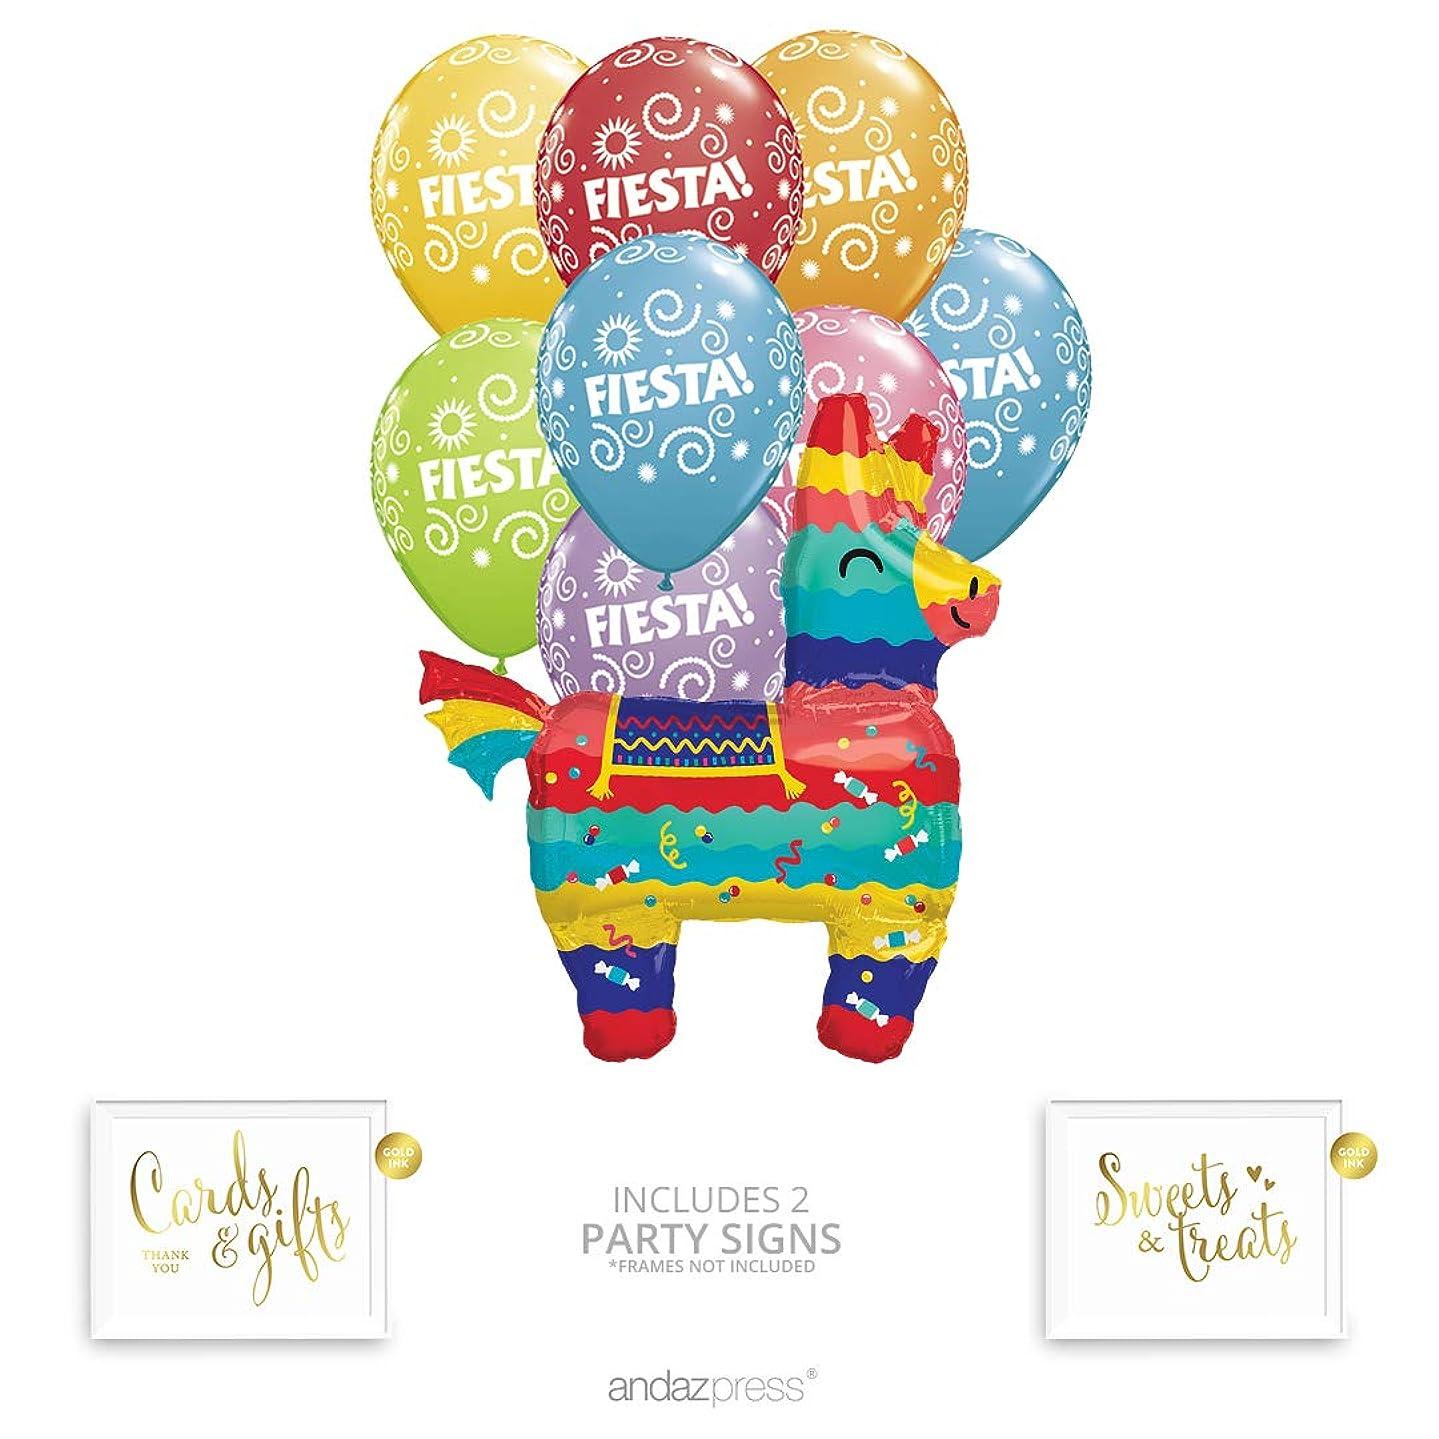 Andaz Press Fiesta Pinata Shape Balloon Bouquet Set, Cinco de Mayo Party Supplies, Inflatable Foil Pinata and Fiesta Latex Balloons, Bulk Balloon Kits for Mexican Fiesta Party Decorations